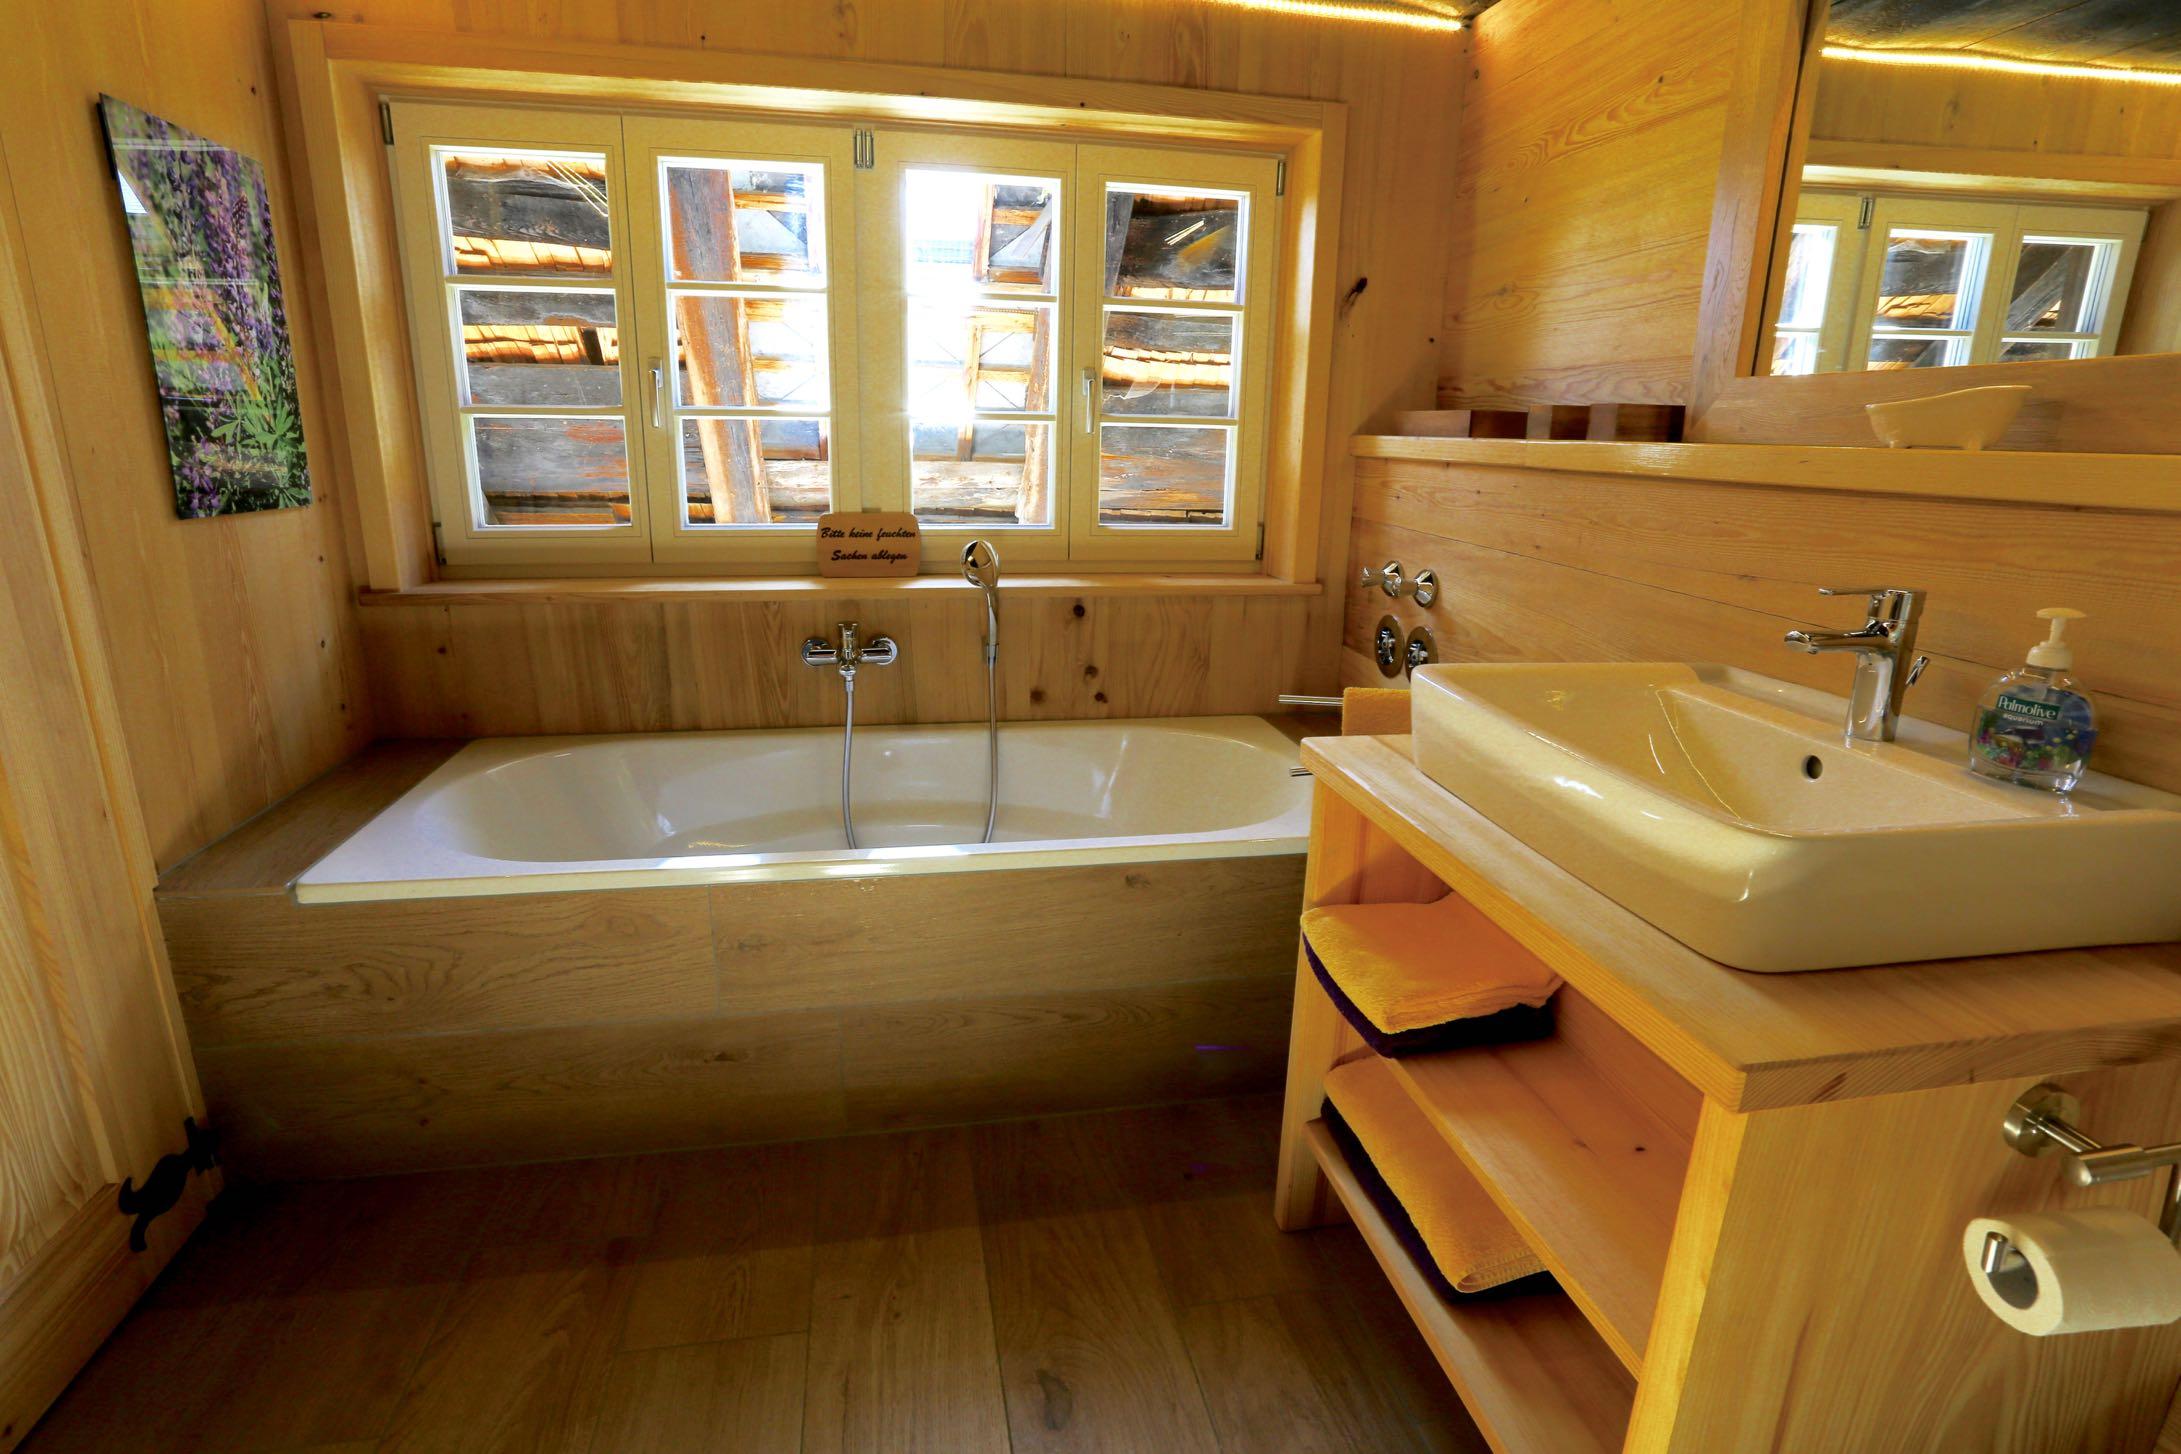 maierhof urlaub im denkmal. Black Bedroom Furniture Sets. Home Design Ideas